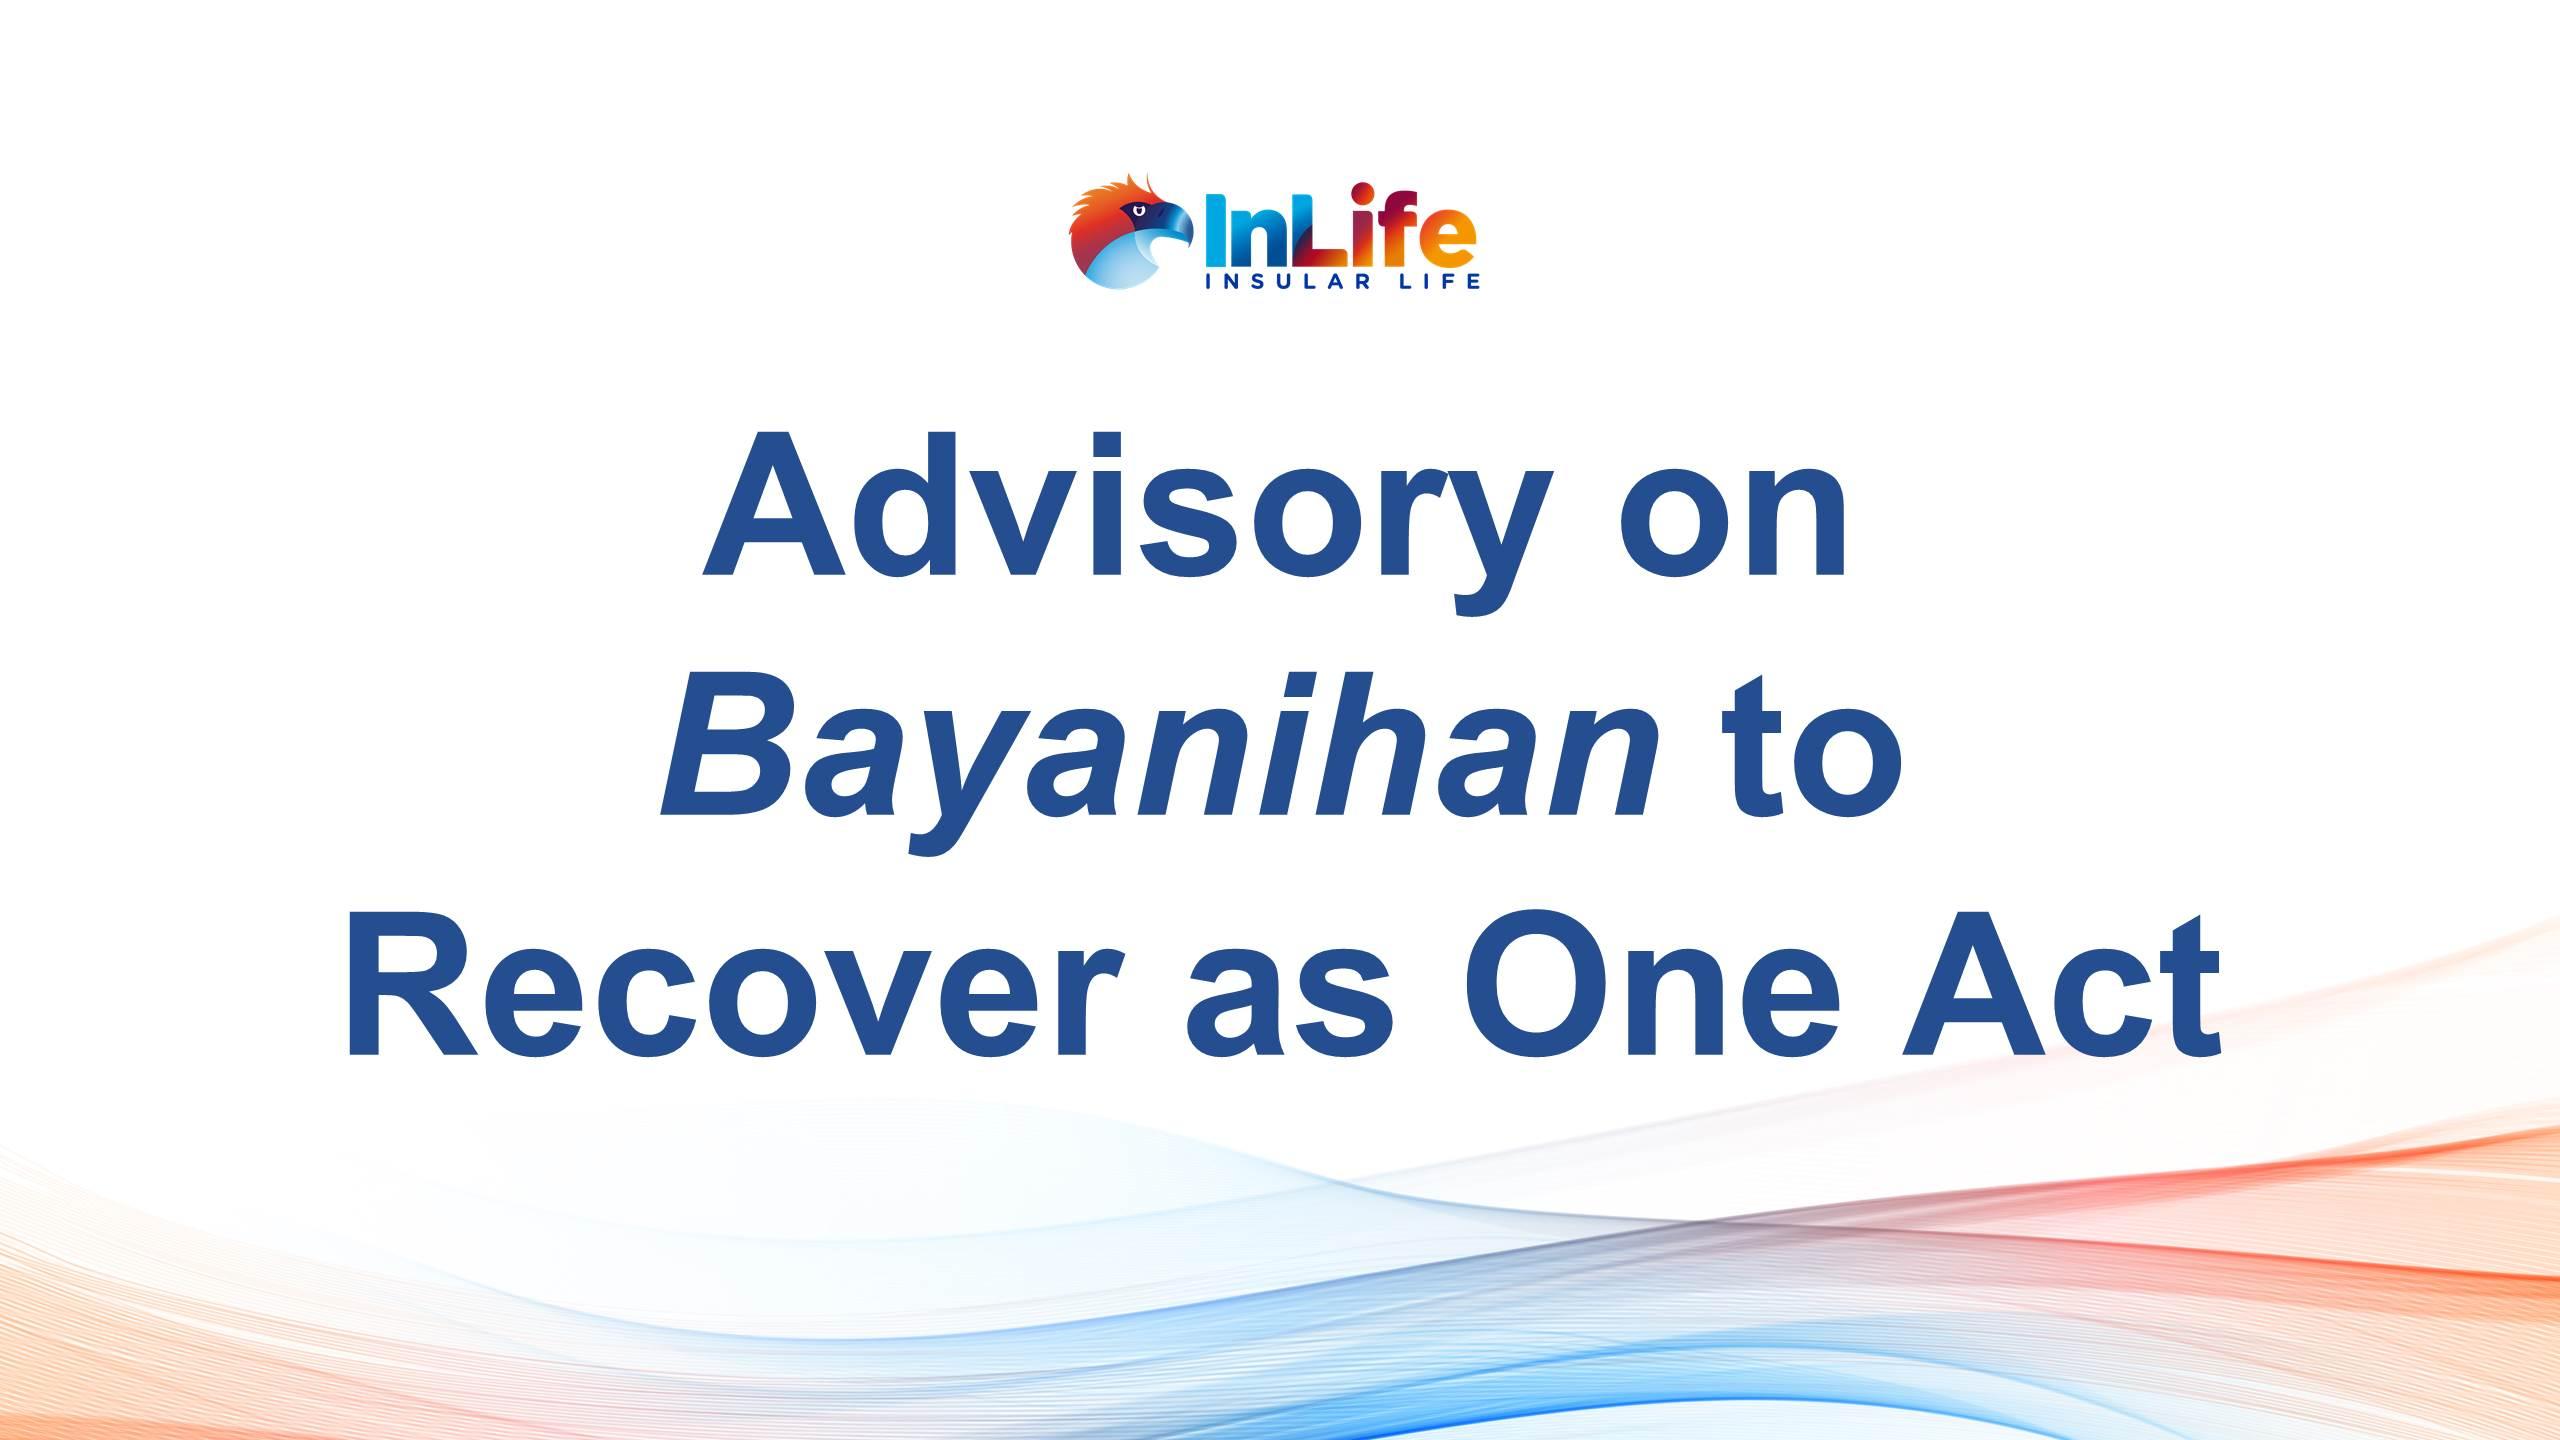 InLife Advisory on Bayanihan 2